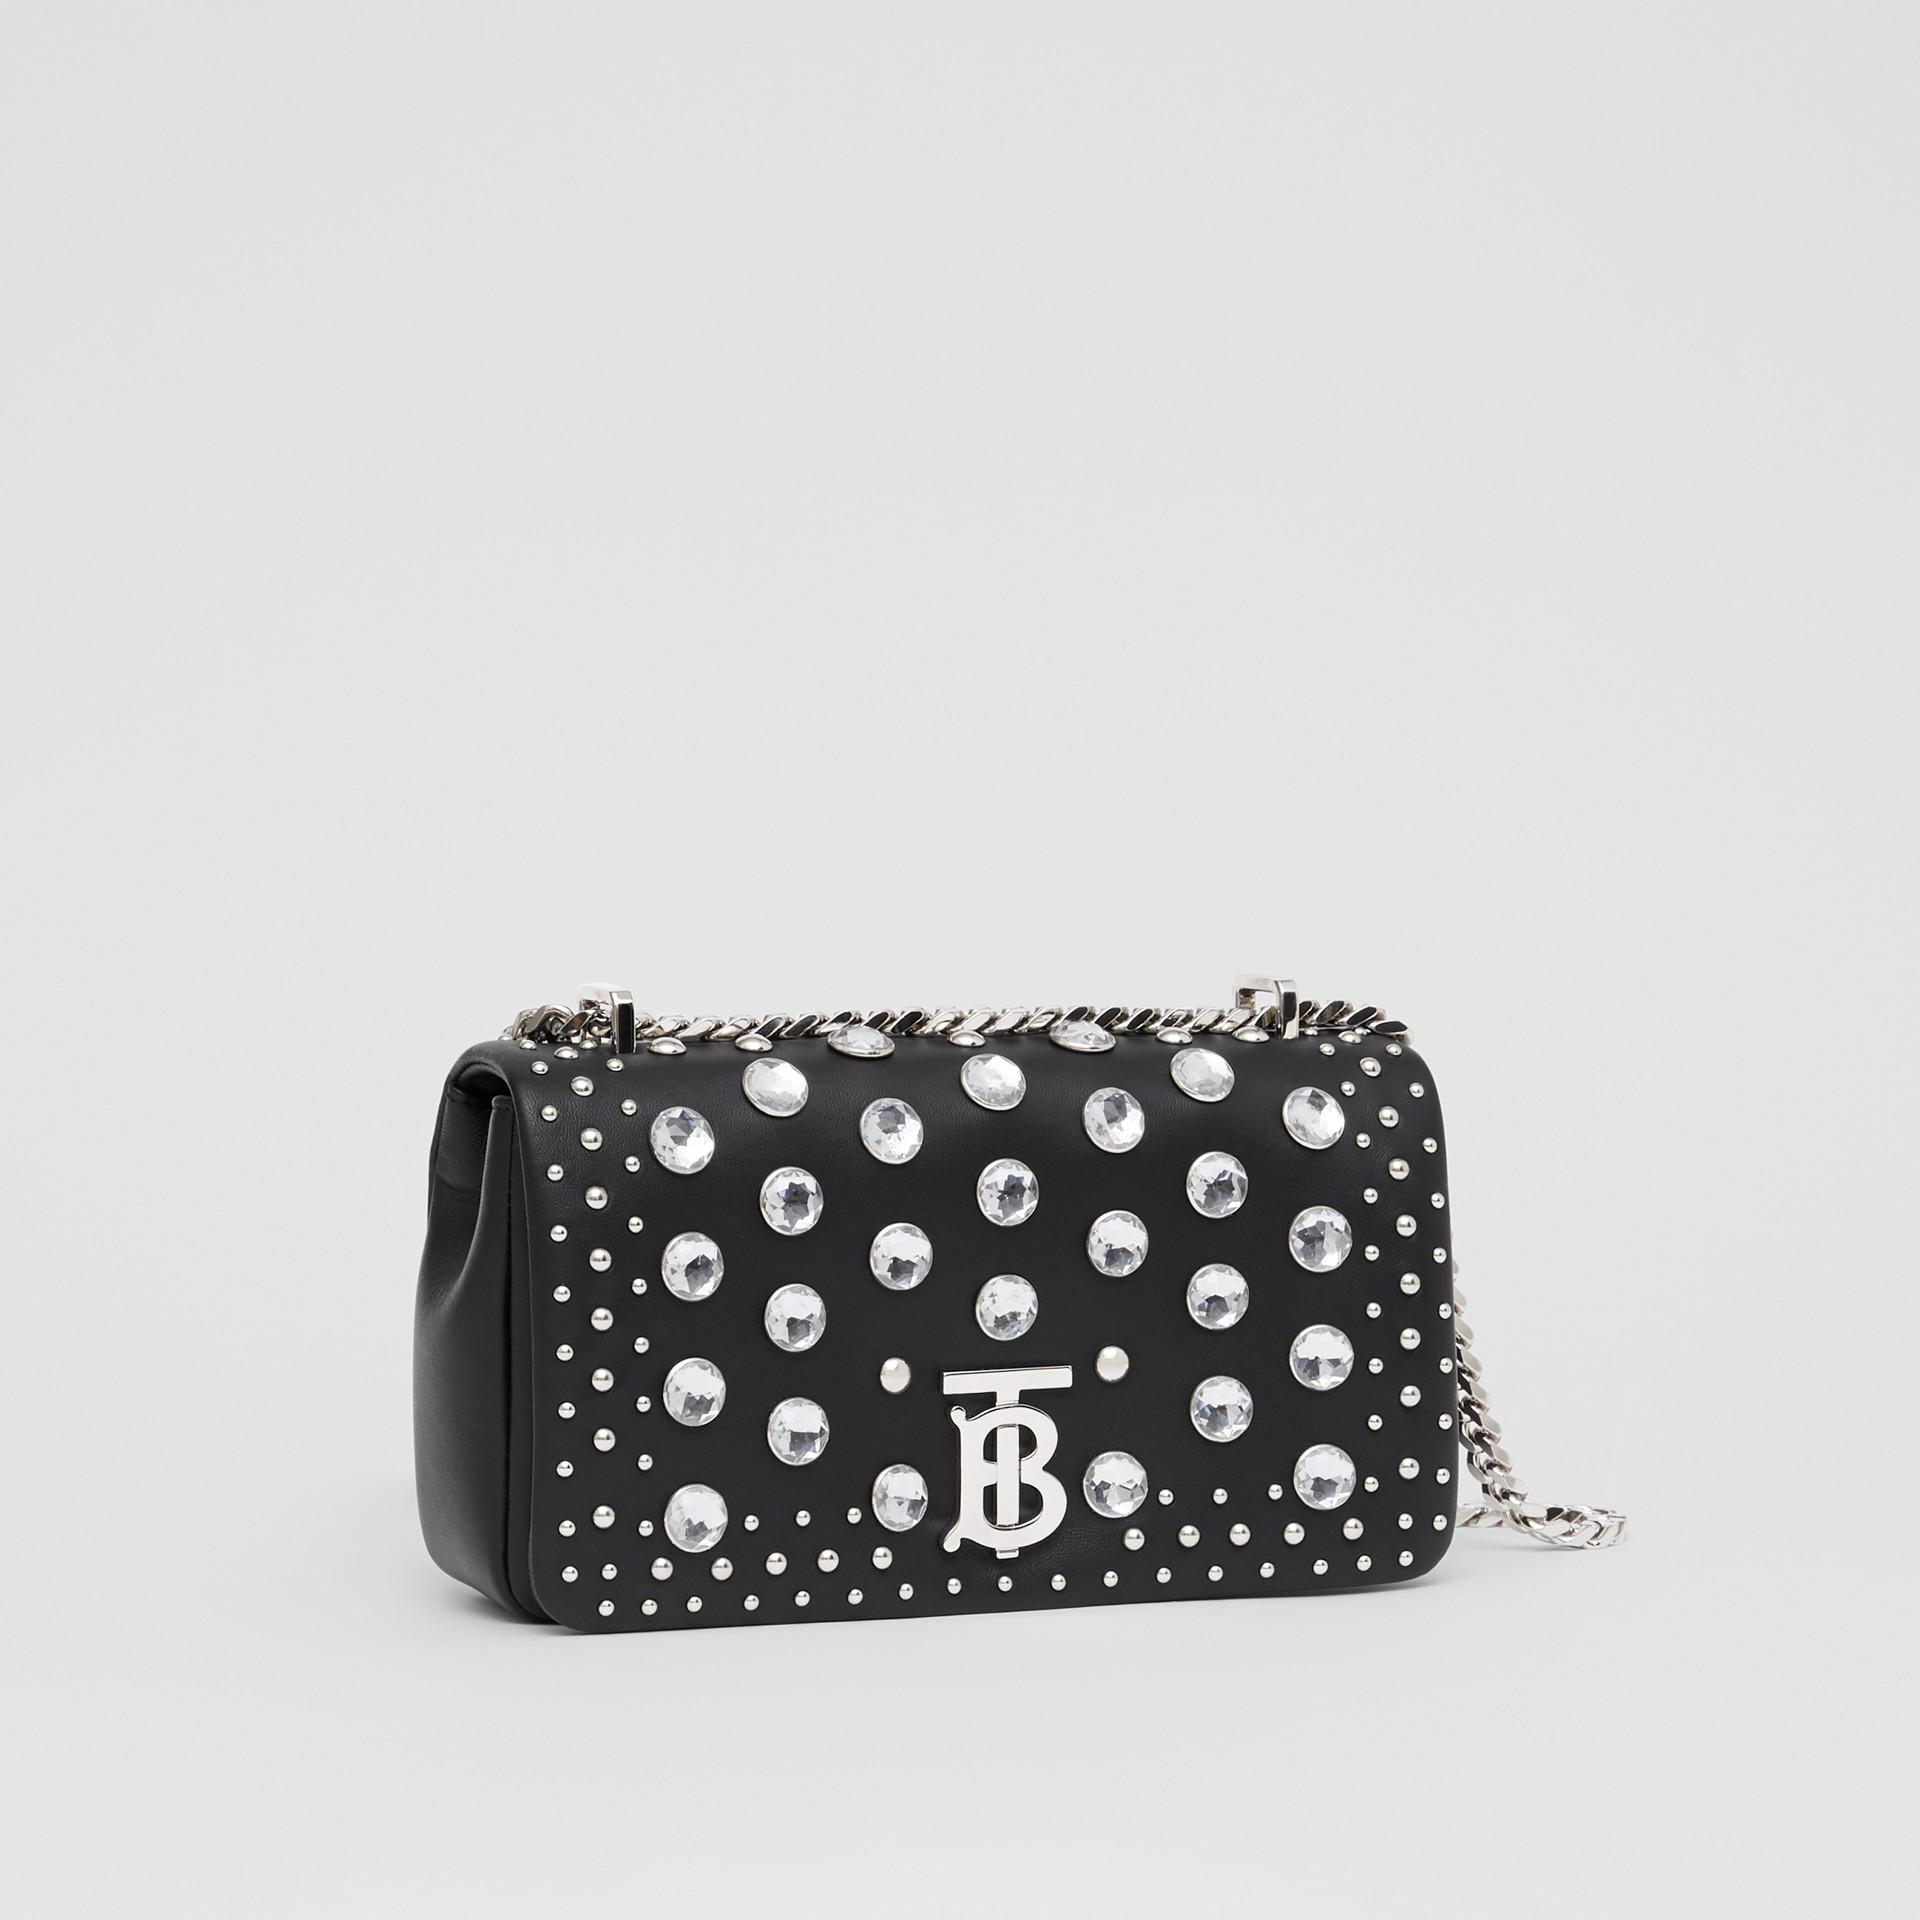 Small Embellished Lambskin Lola Bag in Black - Women | Burberry - gallery image 6